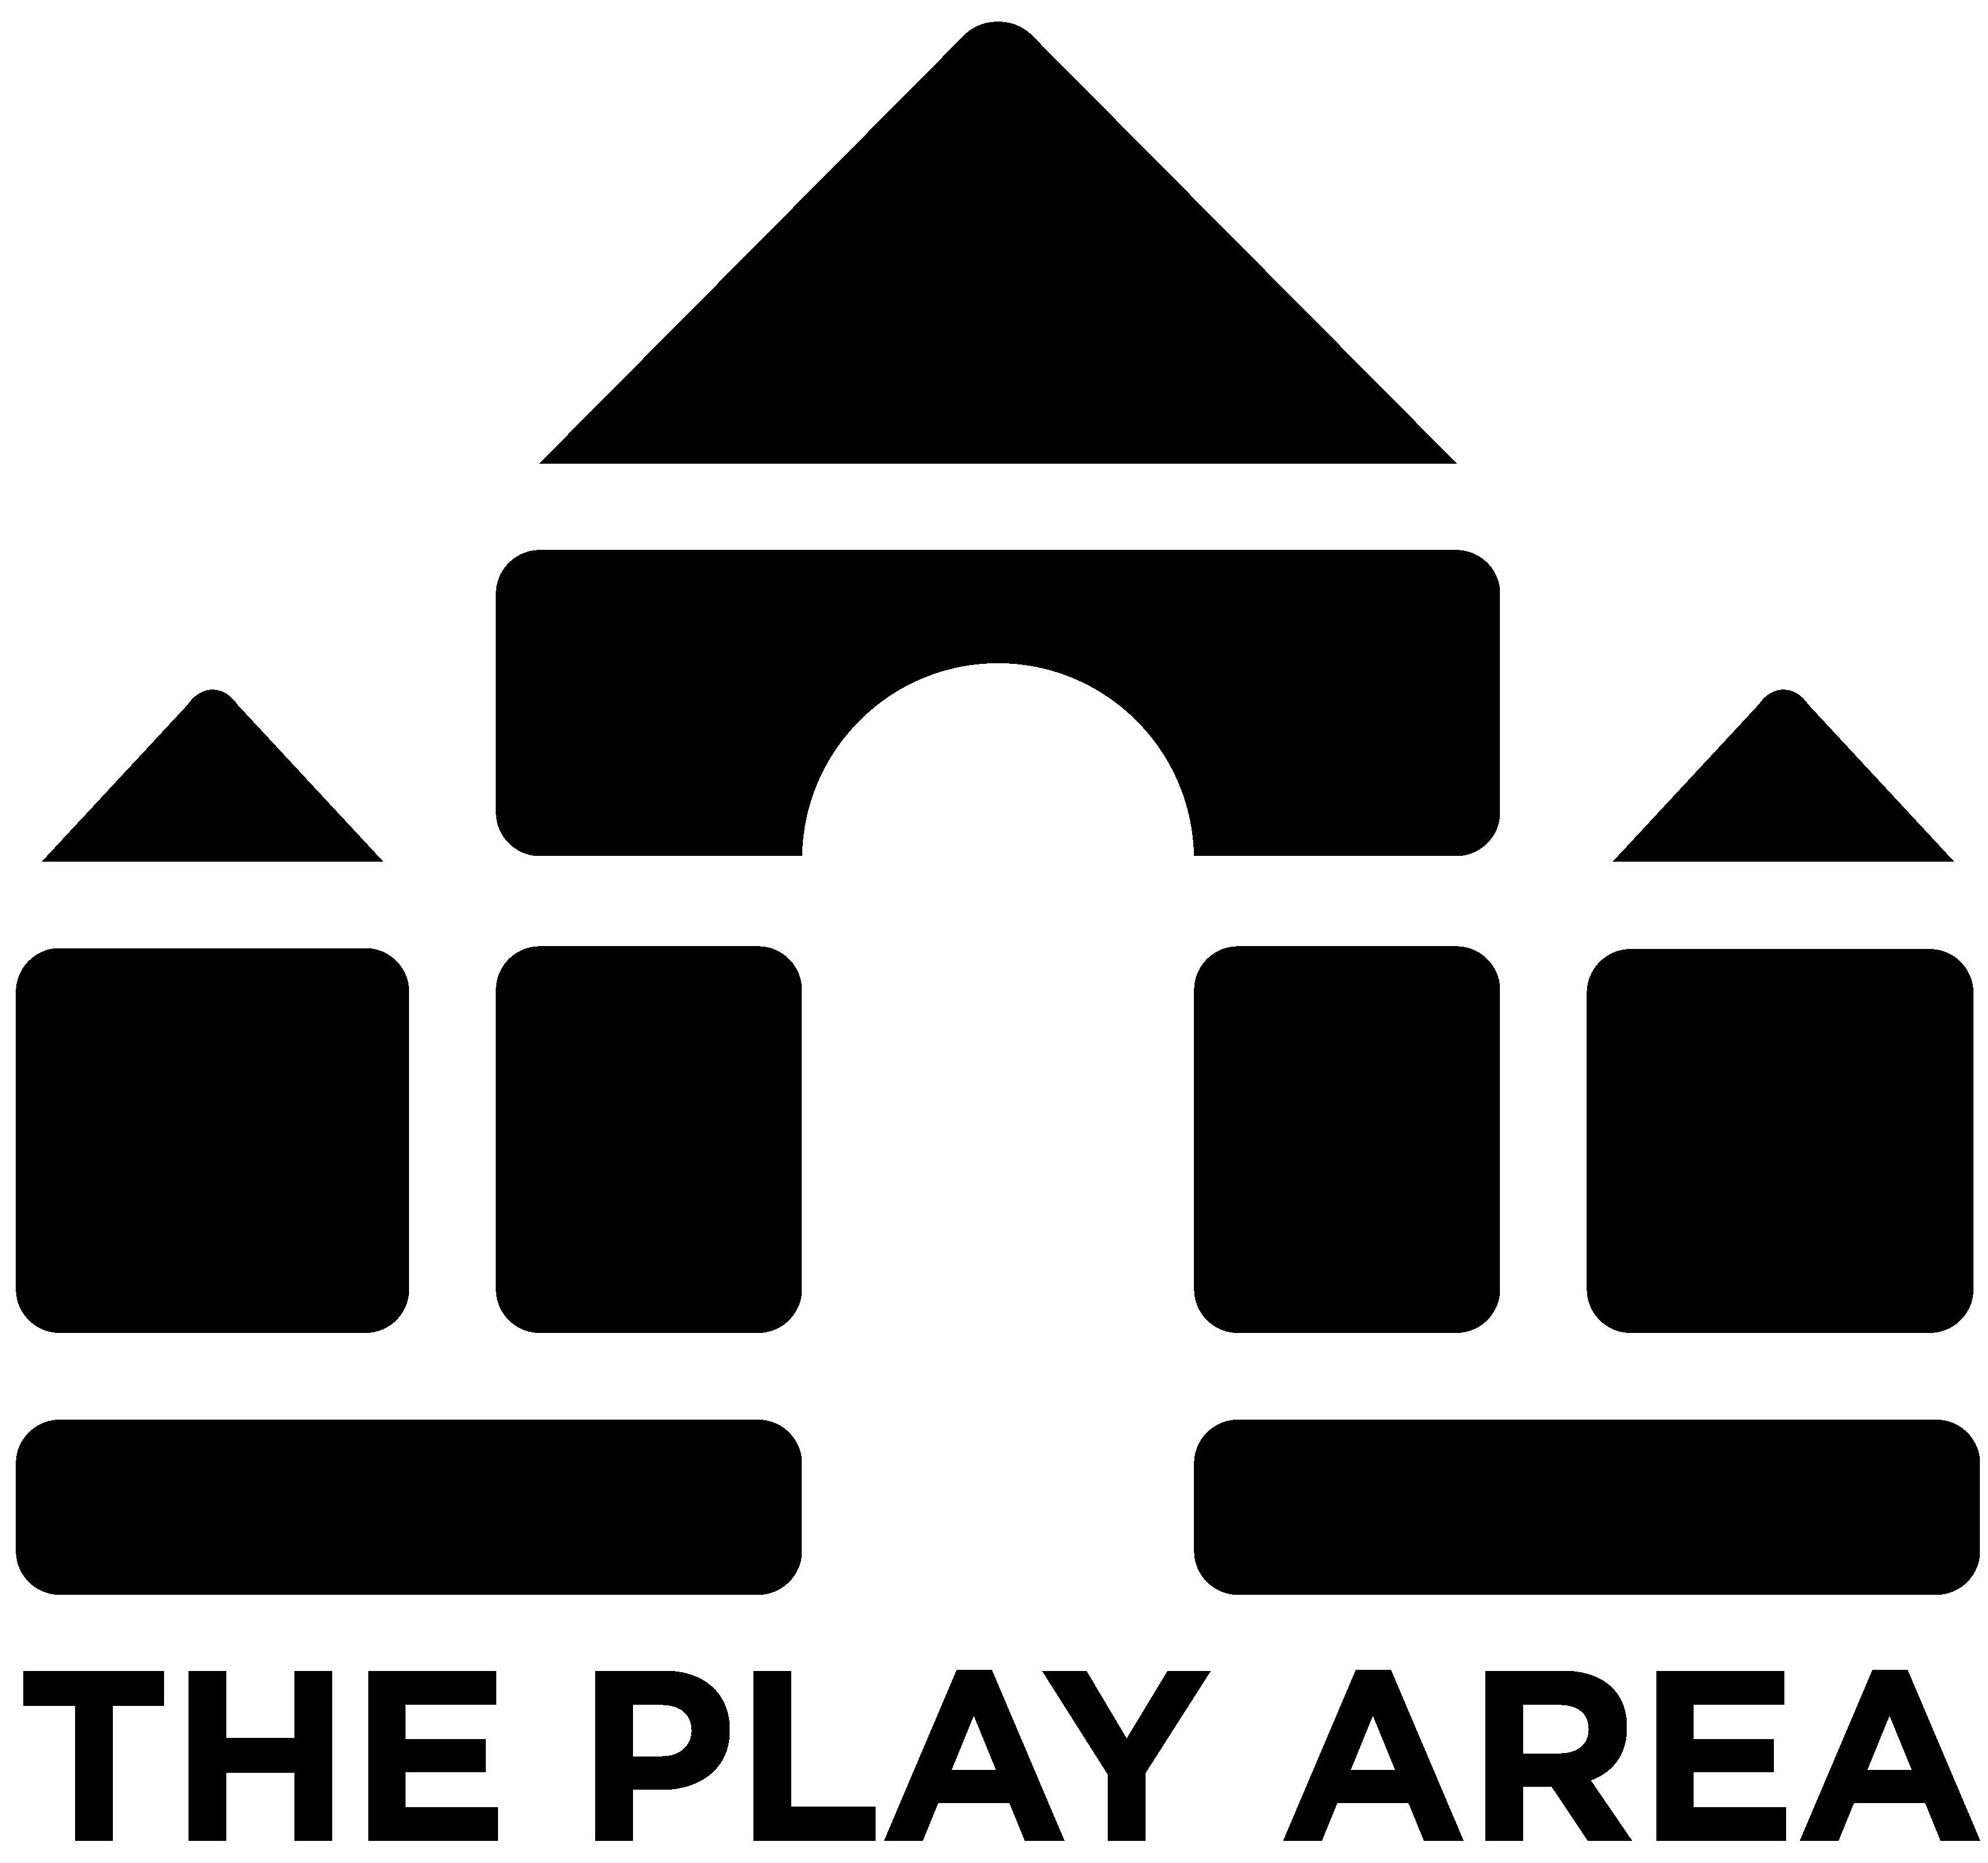 Children's Play Area logo